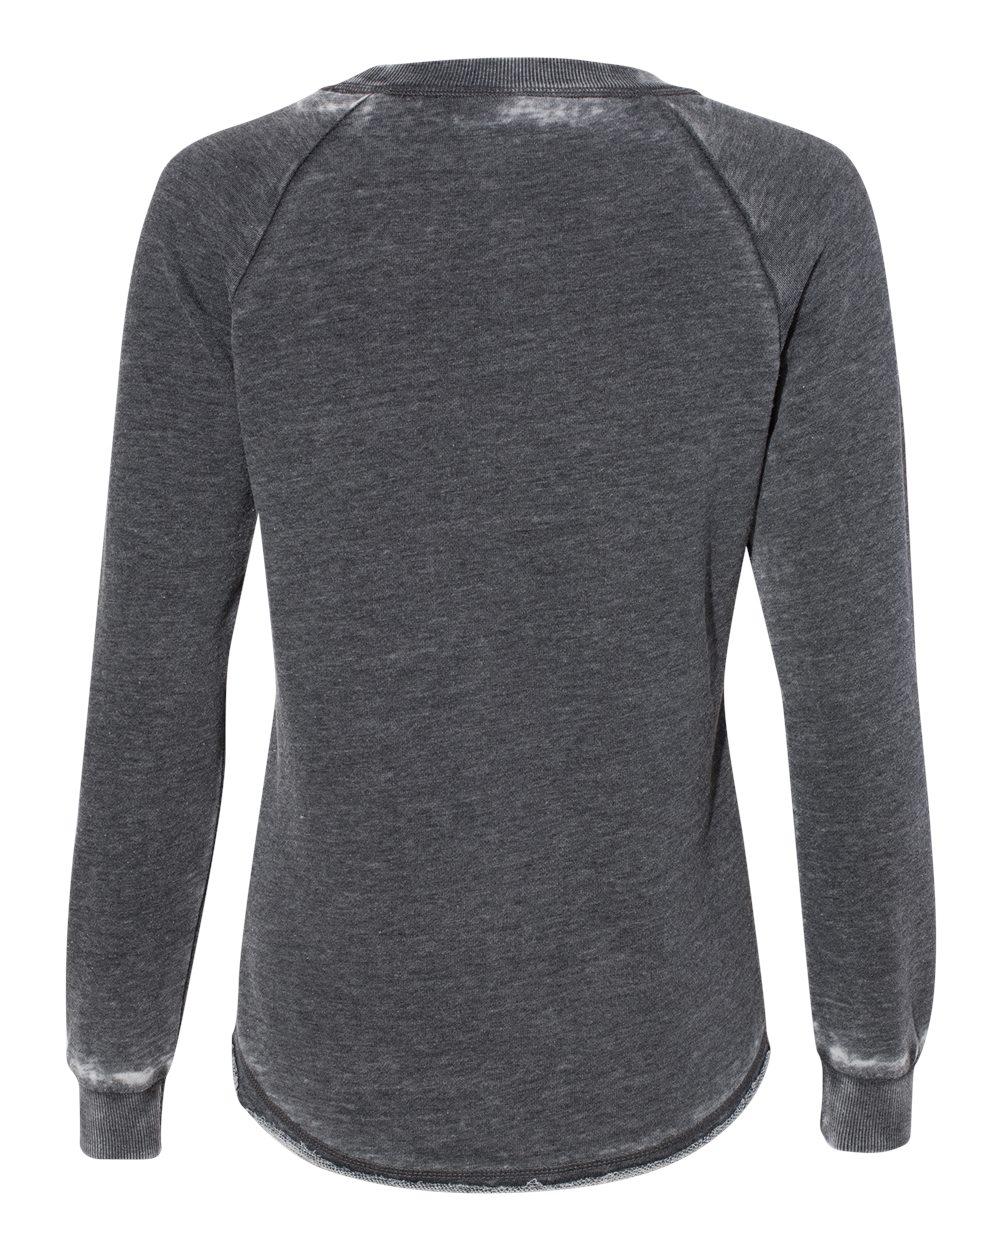 Alternative-Women-s-Lazy-Day-Burnout-French-Terry-LightSweatshirt-8626-up-to-XL thumbnail 16